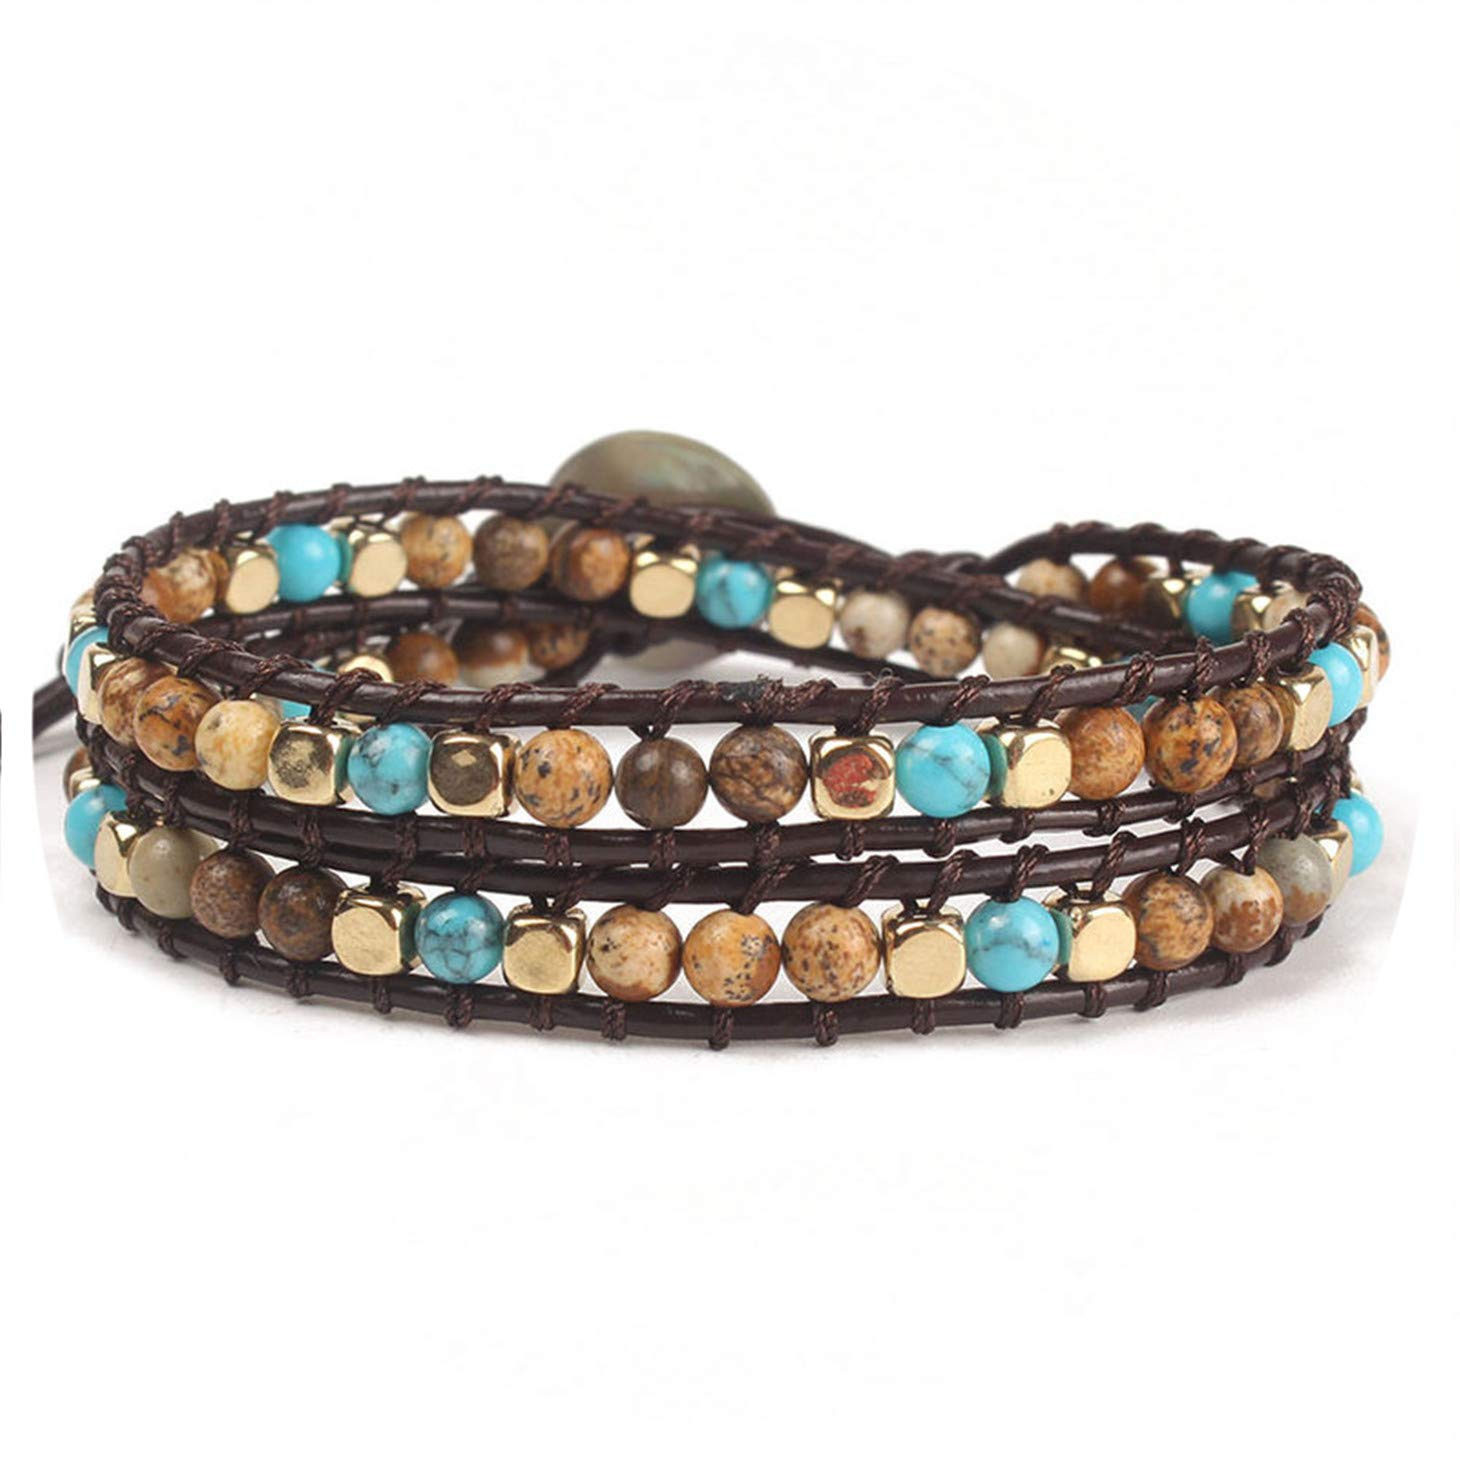 Olive Tayl Ethnic Bracelet & Bangles Handmade 4mm Semi-Precious Stones Beaded Bracelet for Men & Women Jewelry by Olive Tayl (Image #1)